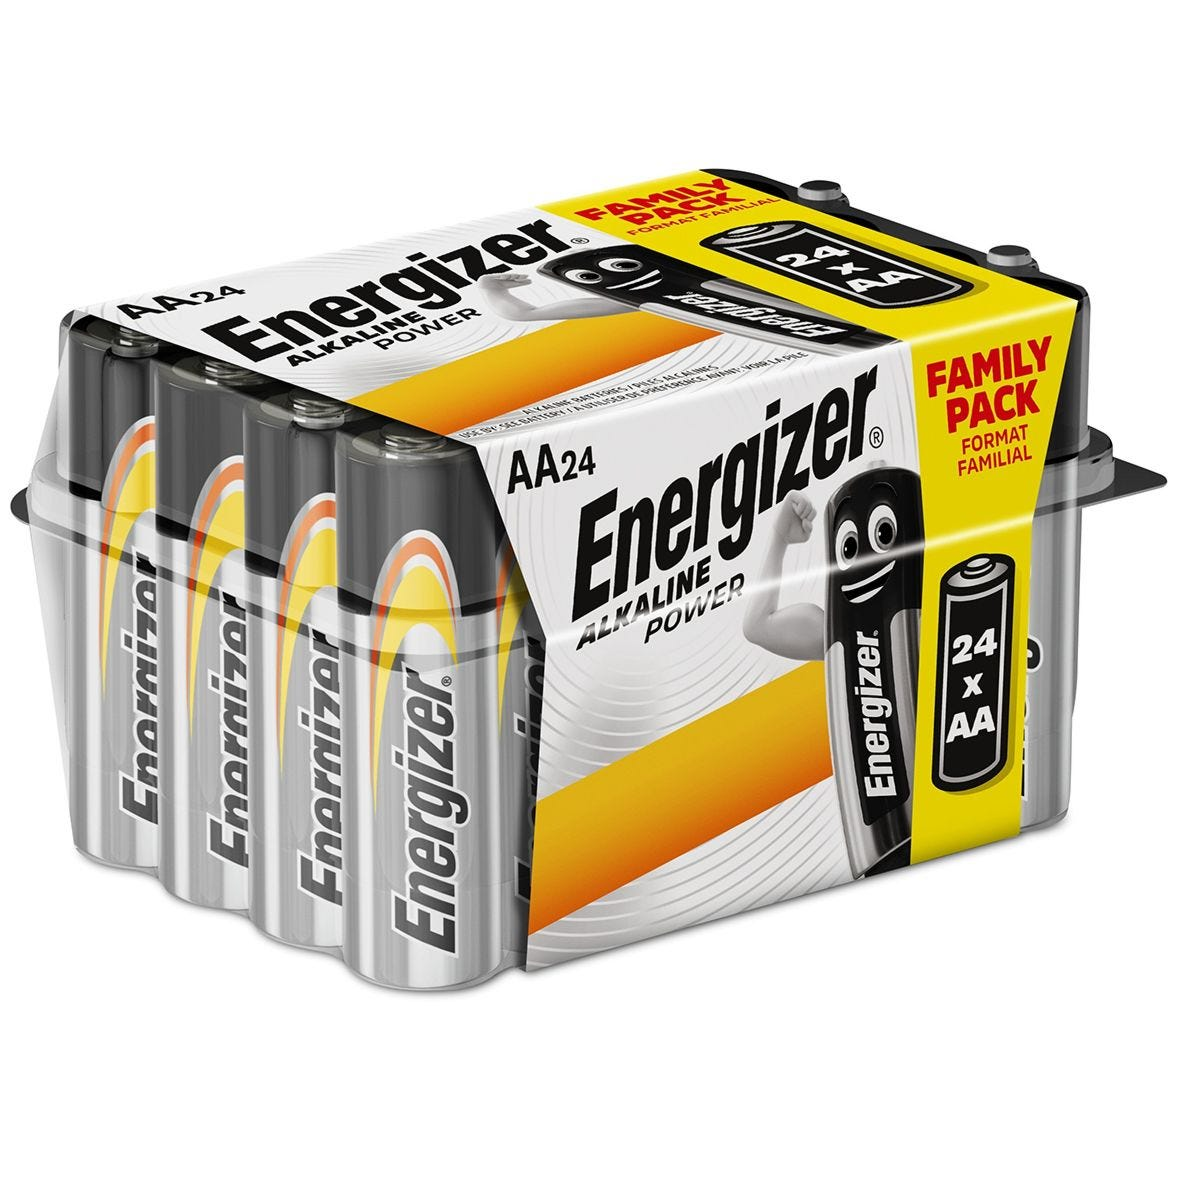 Energizer AA Alkaline Power Batteries - 24 Pack